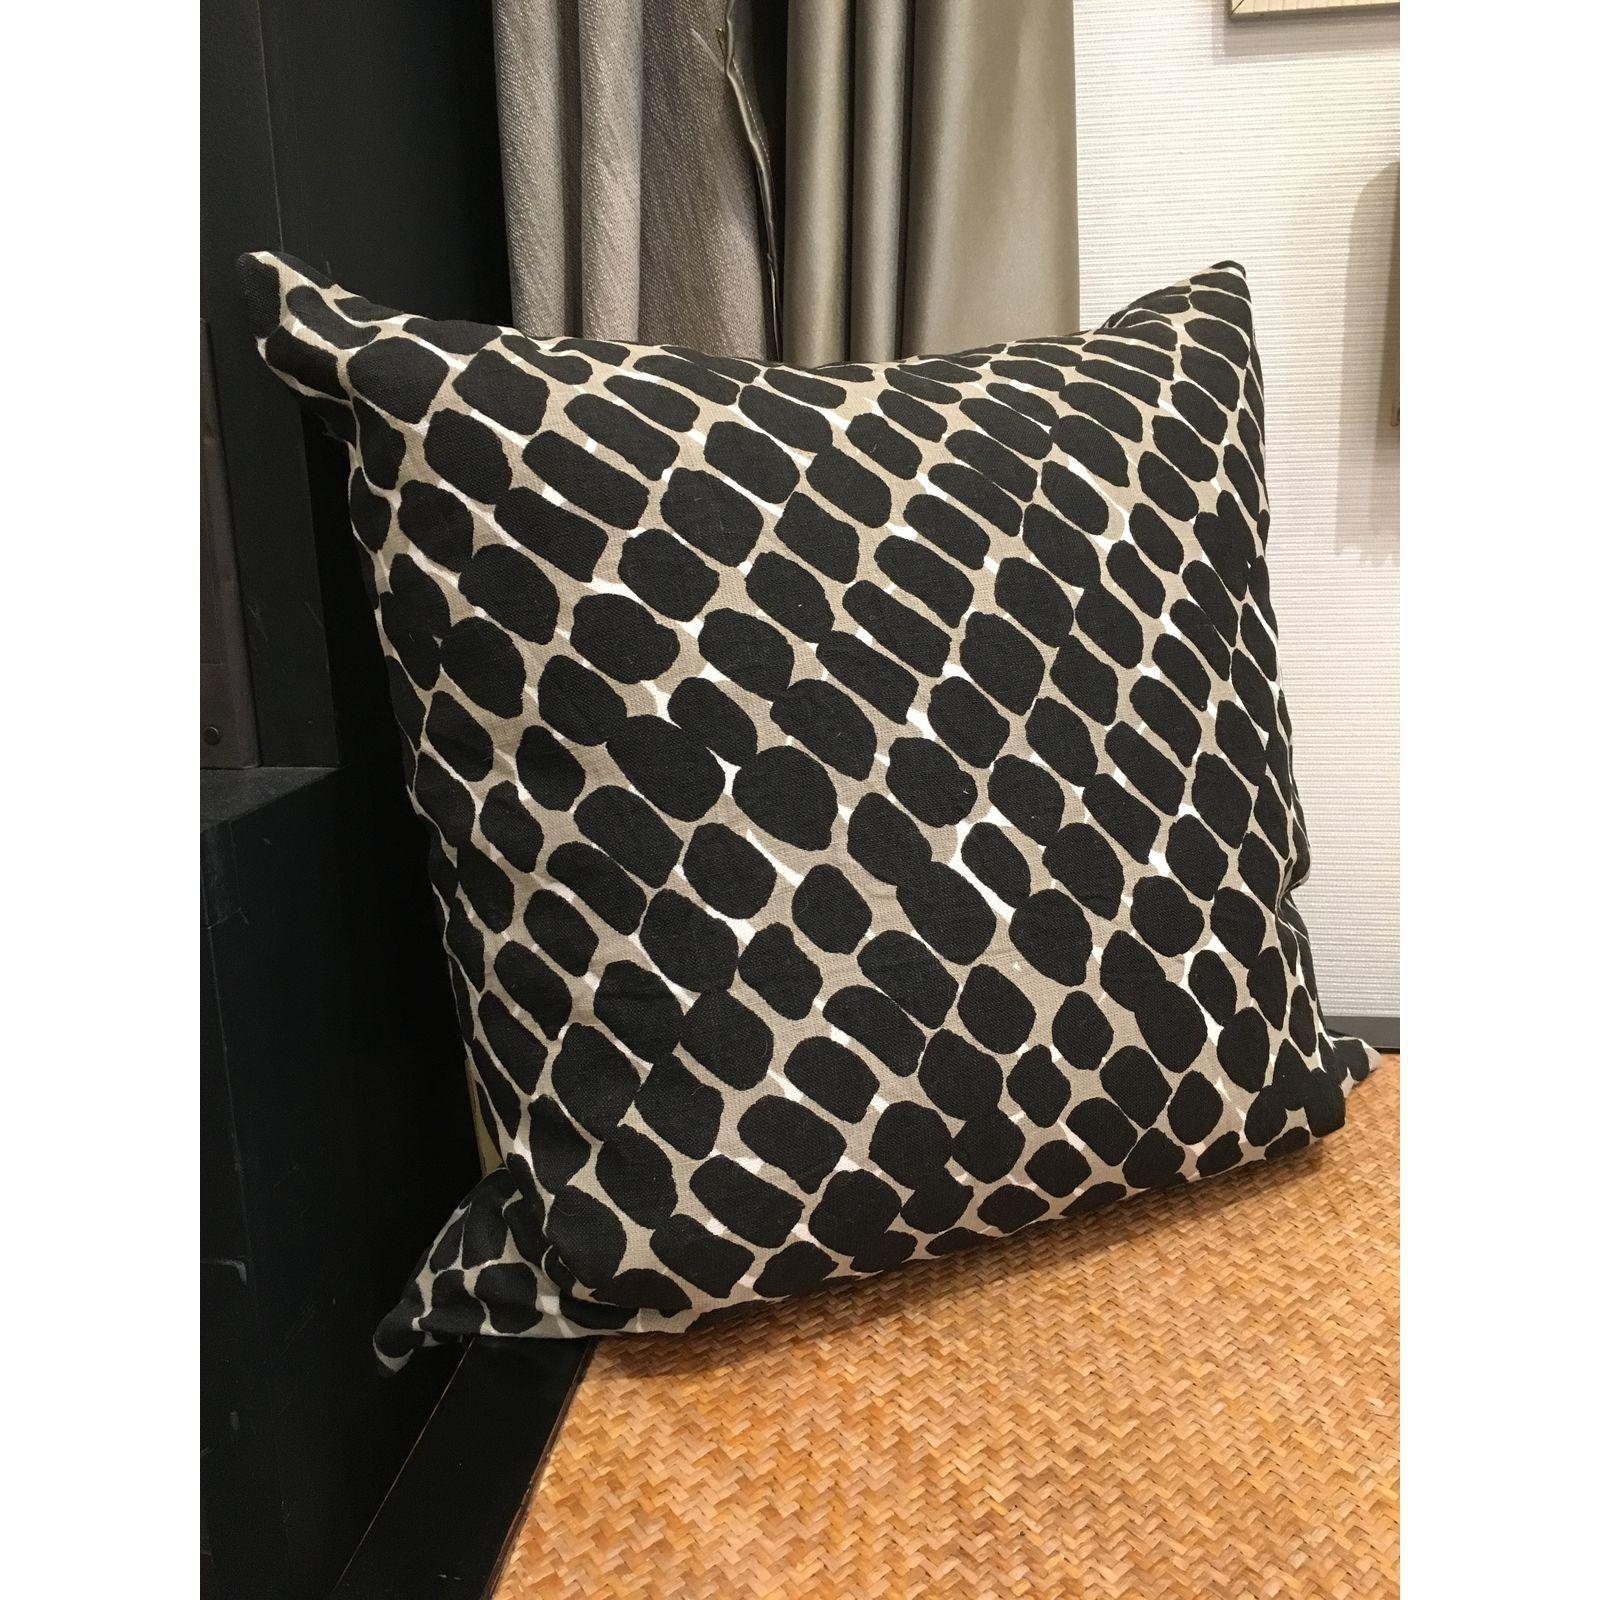 Kate Spade Dobbins Pillow Image 2 Of 4 Pillows Decorative Pillows Shop Decorative Pillows